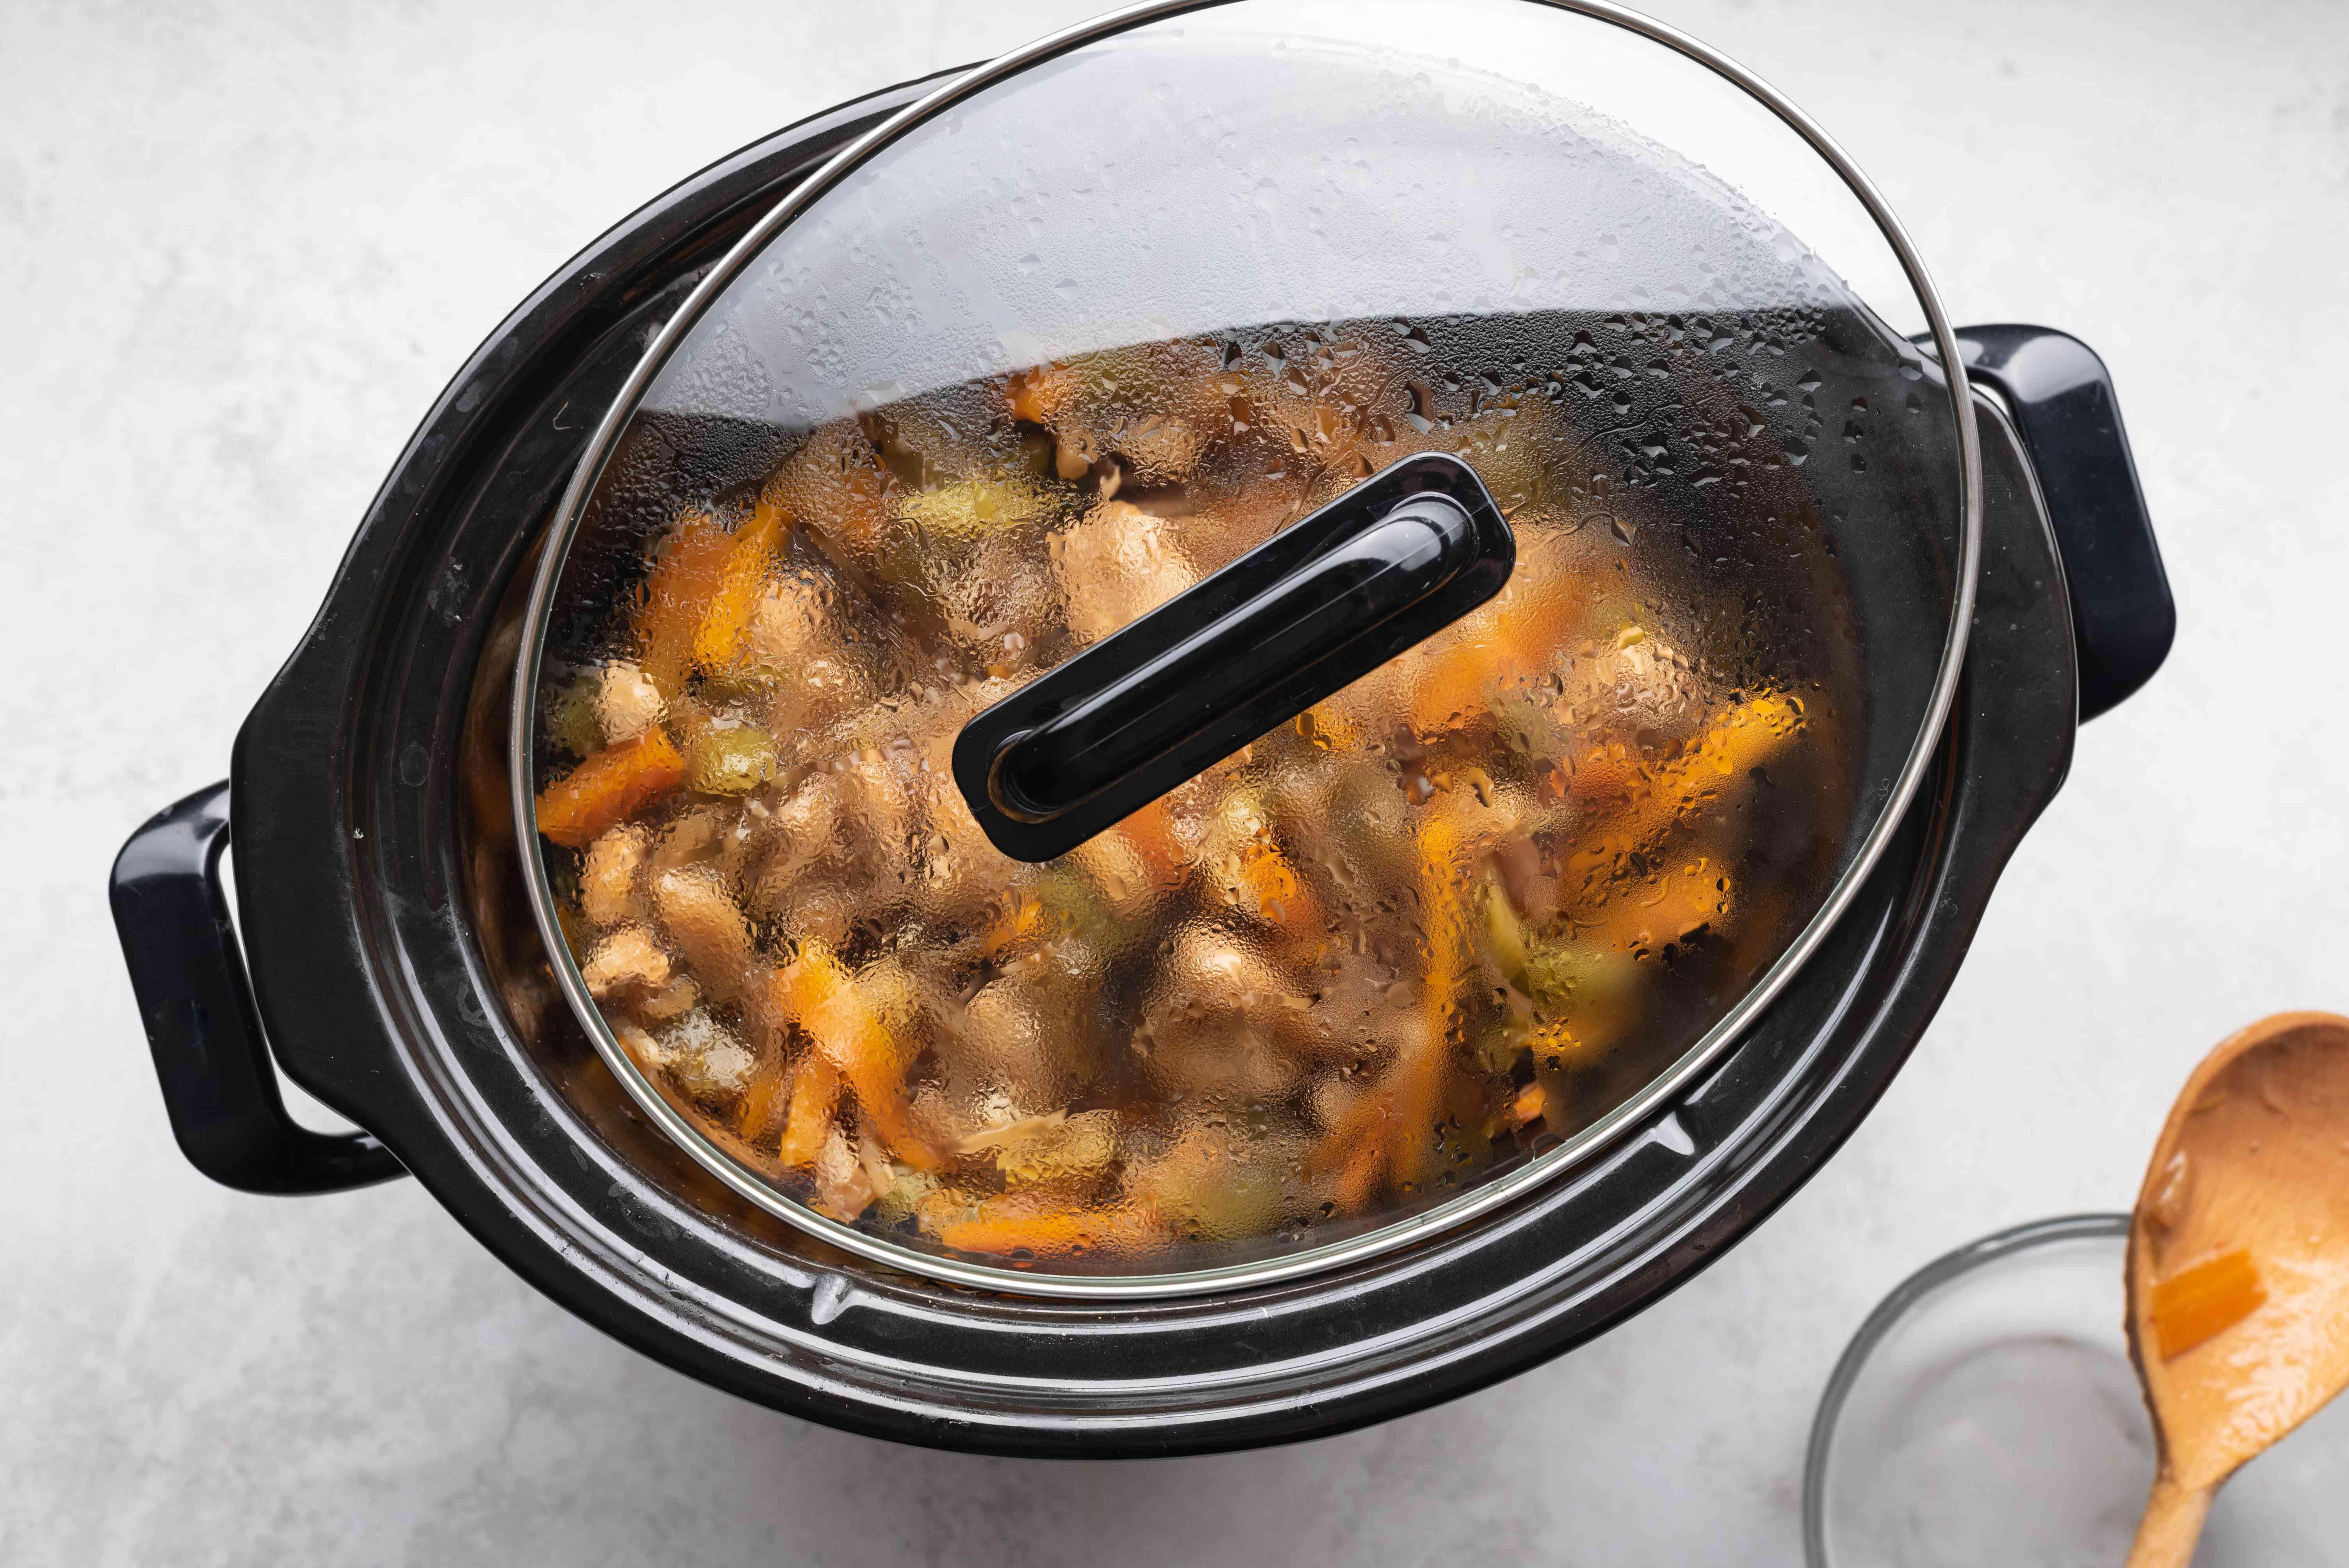 Crockpot Chicken Chow Mein cooking in a crockpot